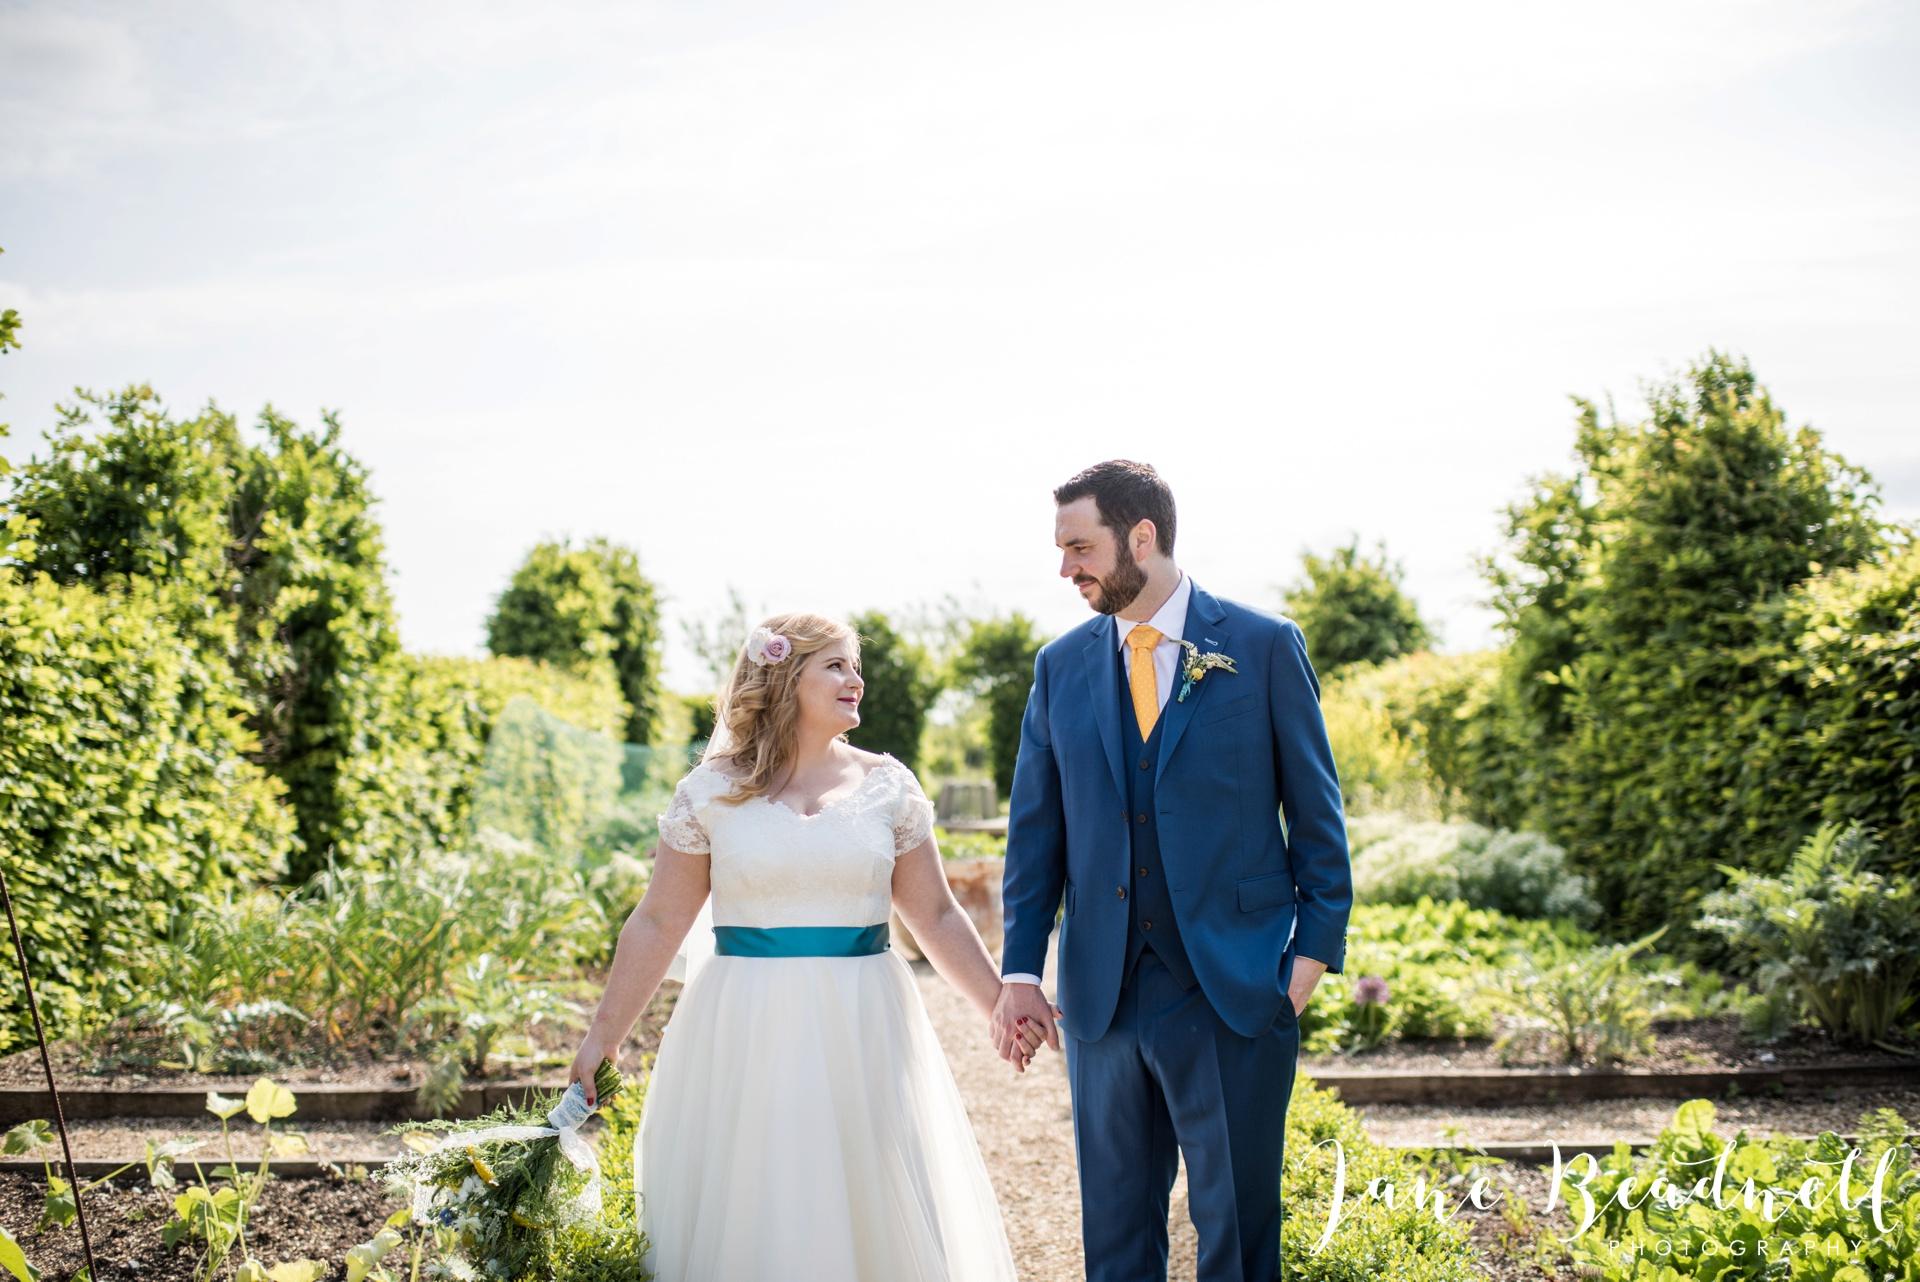 South Farm Wedding photography Hertfordshire by Jane Beadnell Photography fine art wedding photographer_0124